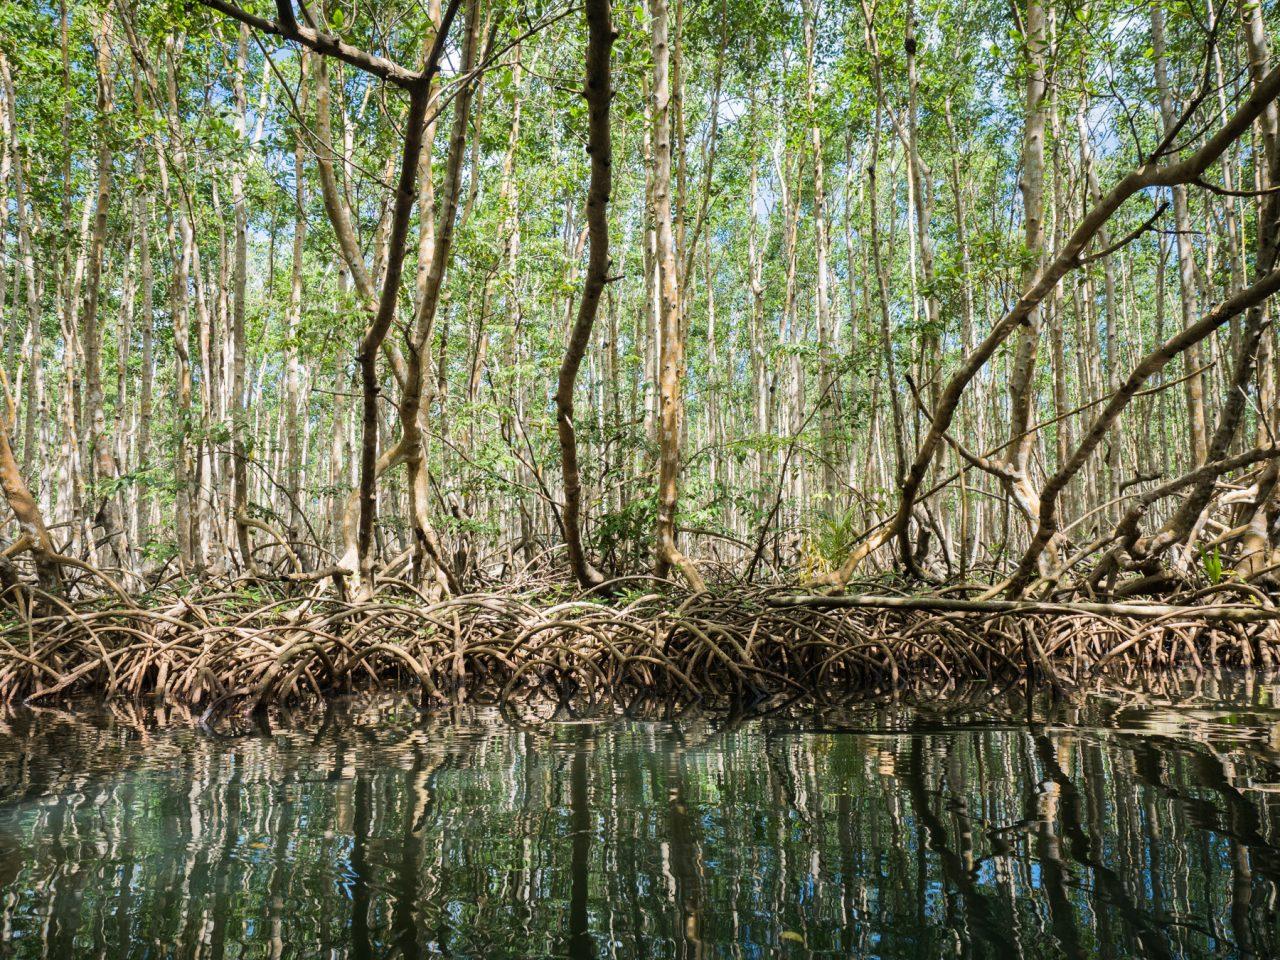 mangrove guadeloupe-canoe kayak mangrove guadeloupe-la saintoise mangrove guadeloupe - sous les palétuviers